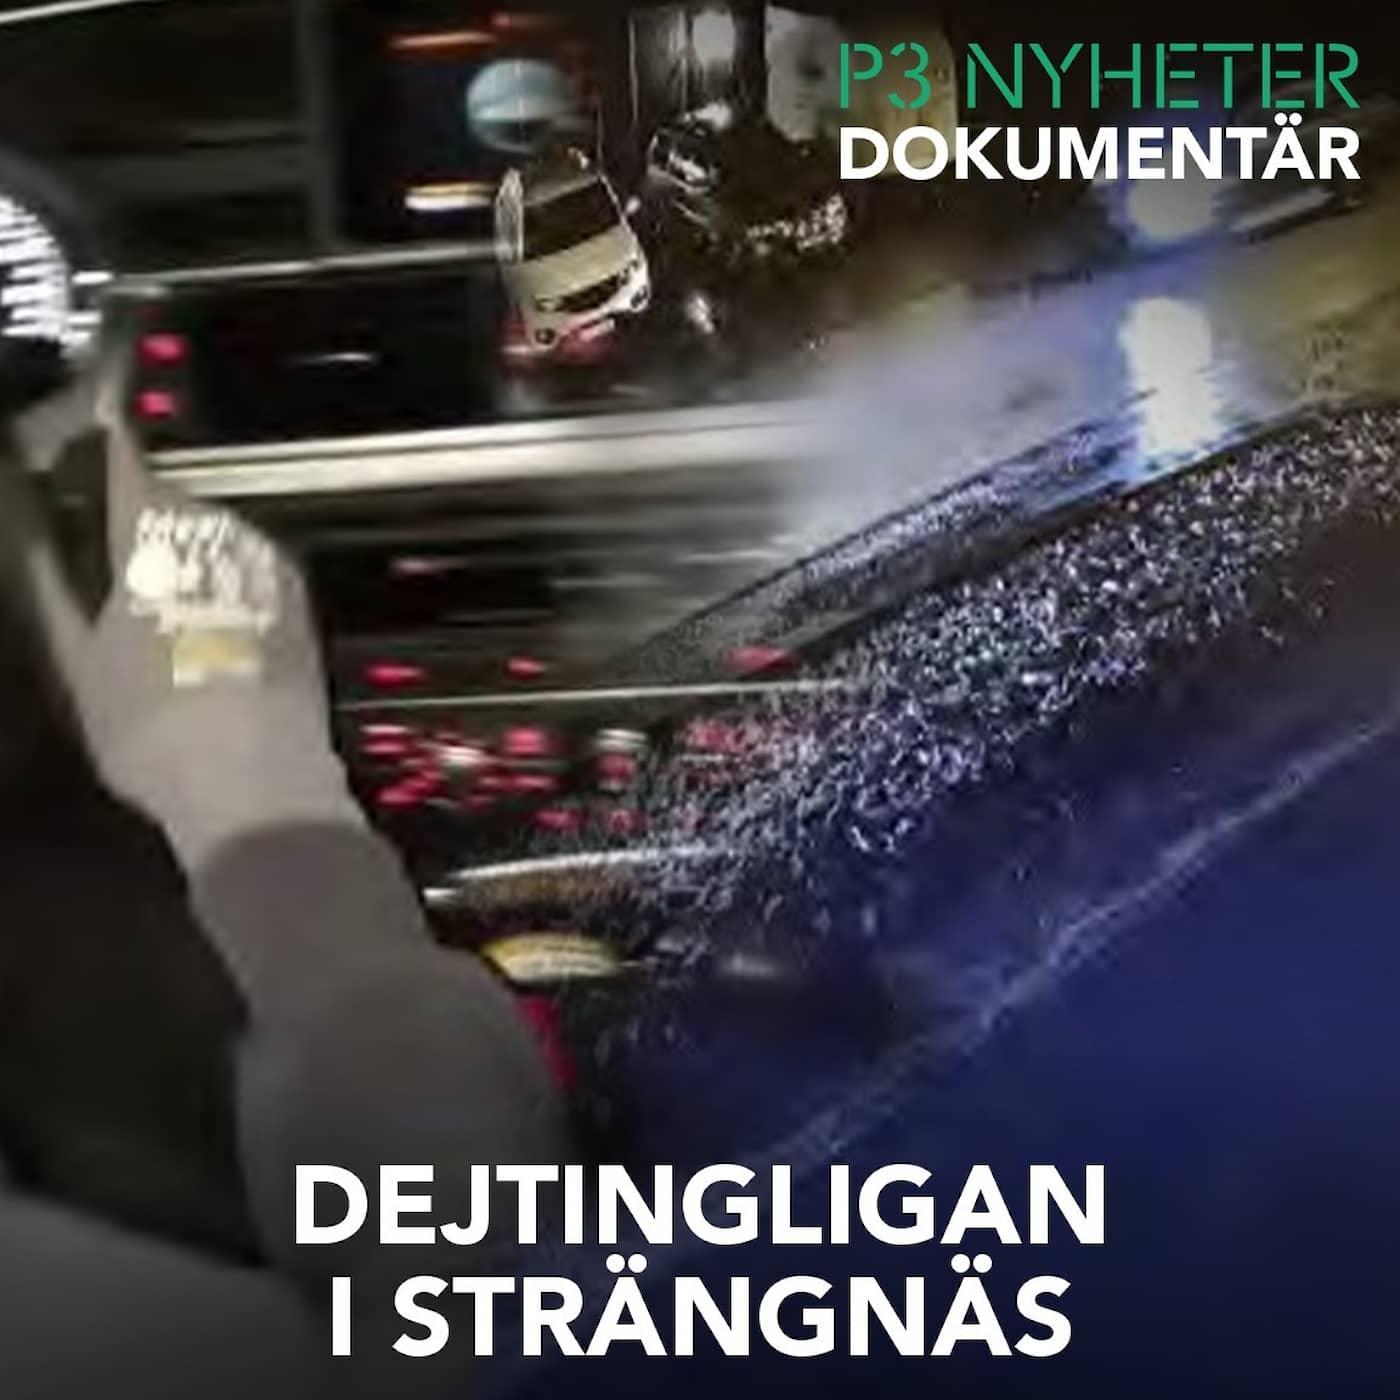 Dejtingligan i Strängnäs